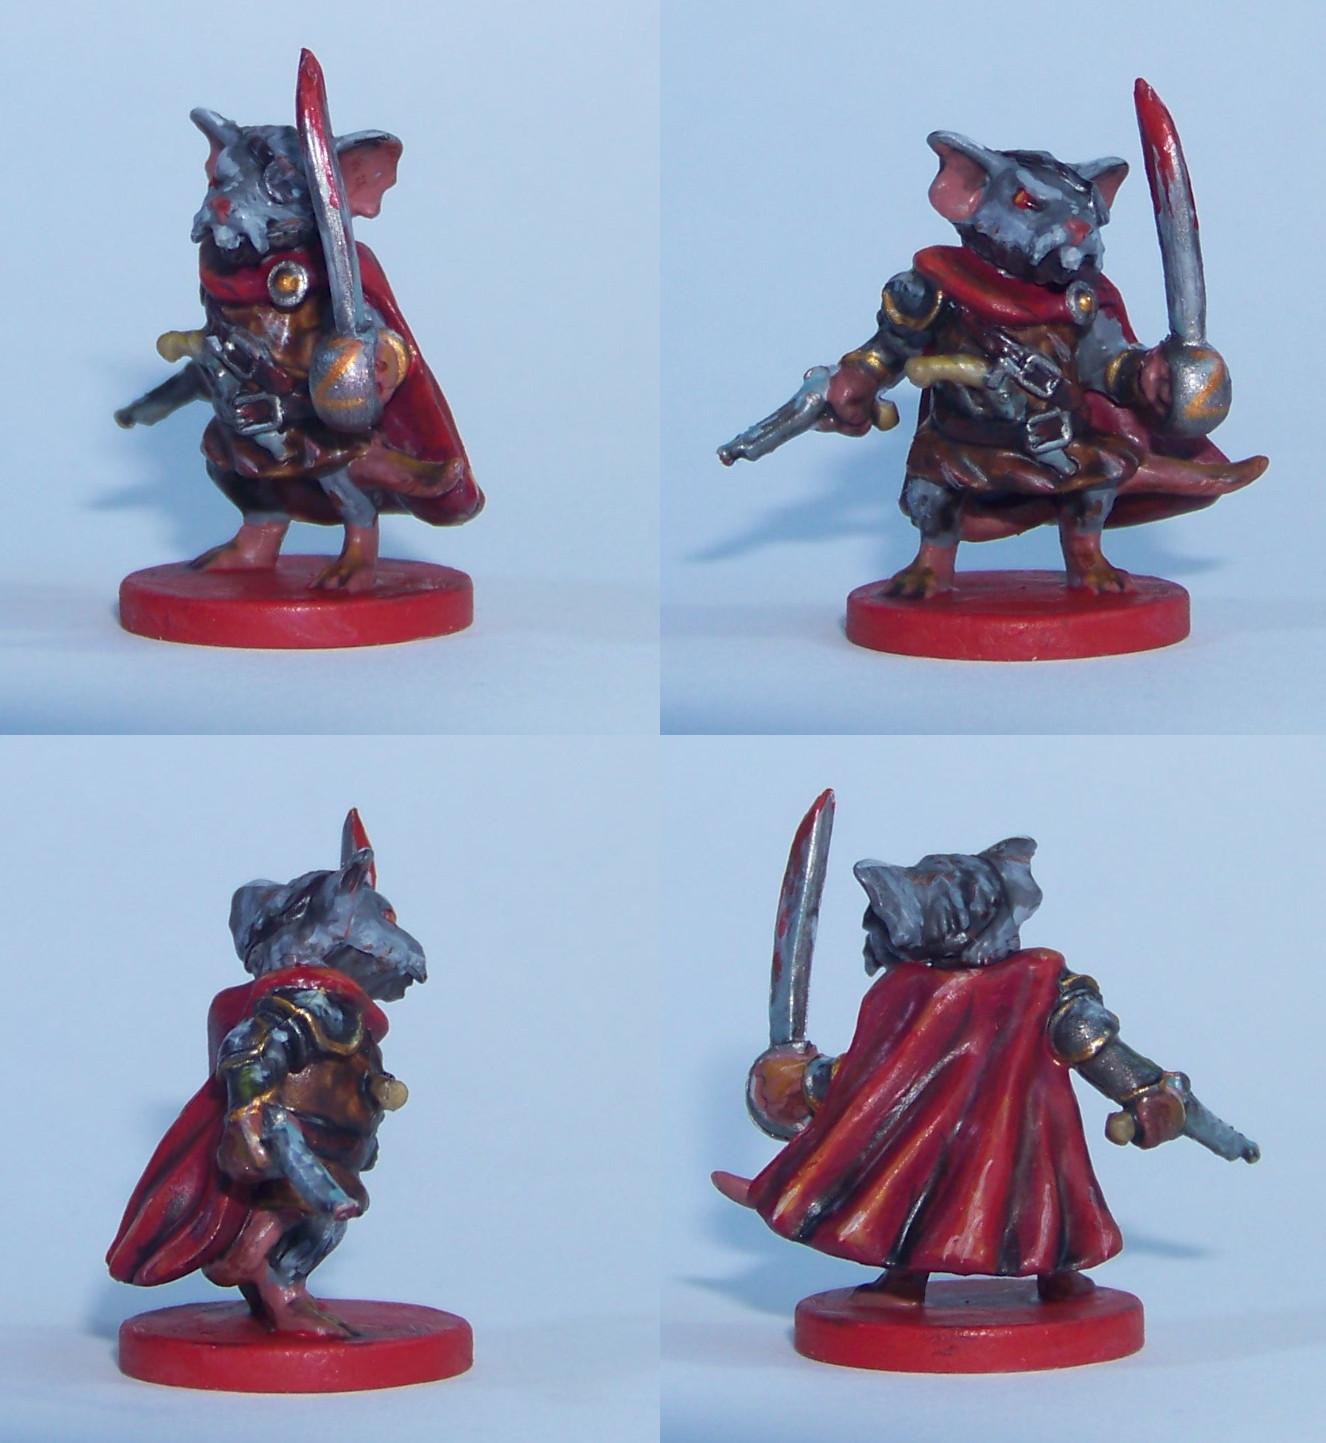 De ratones y Magia - miniaturas - Vurst 2